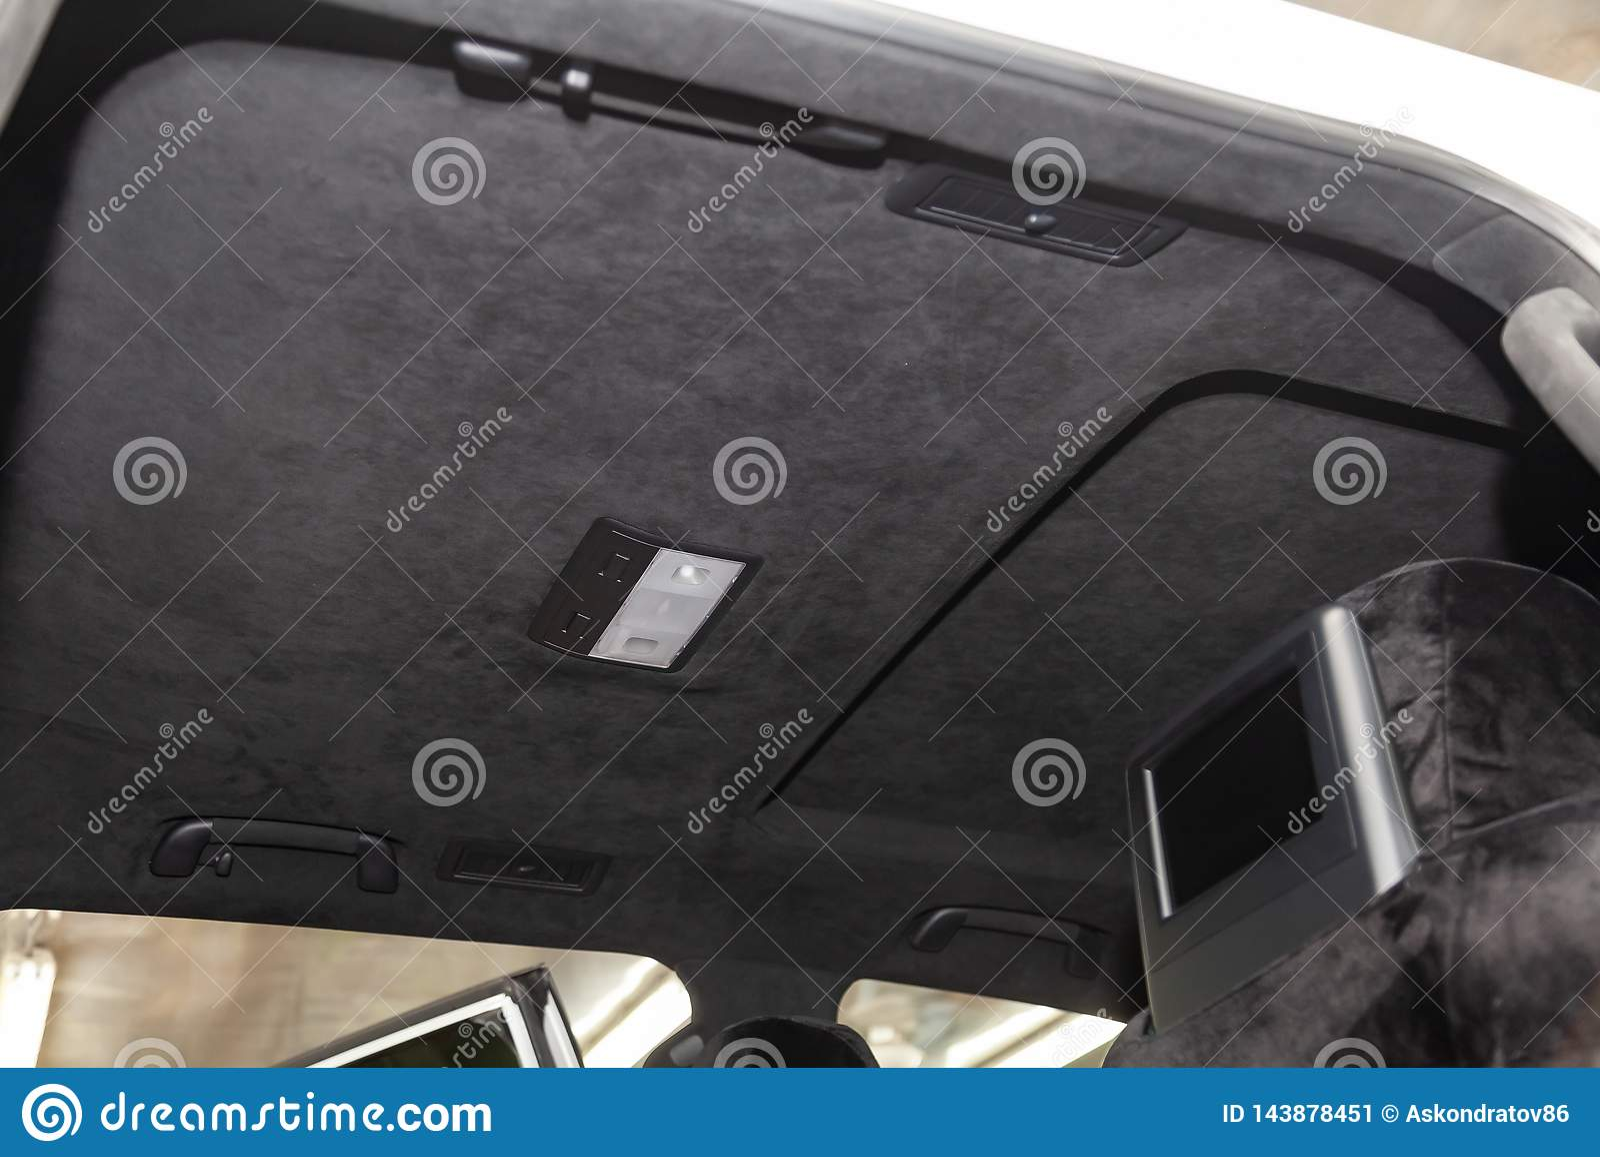 O teto do carro de SUV puxado pelo alkantara material macio preto na oficina para ajustar e denominar o interiorof